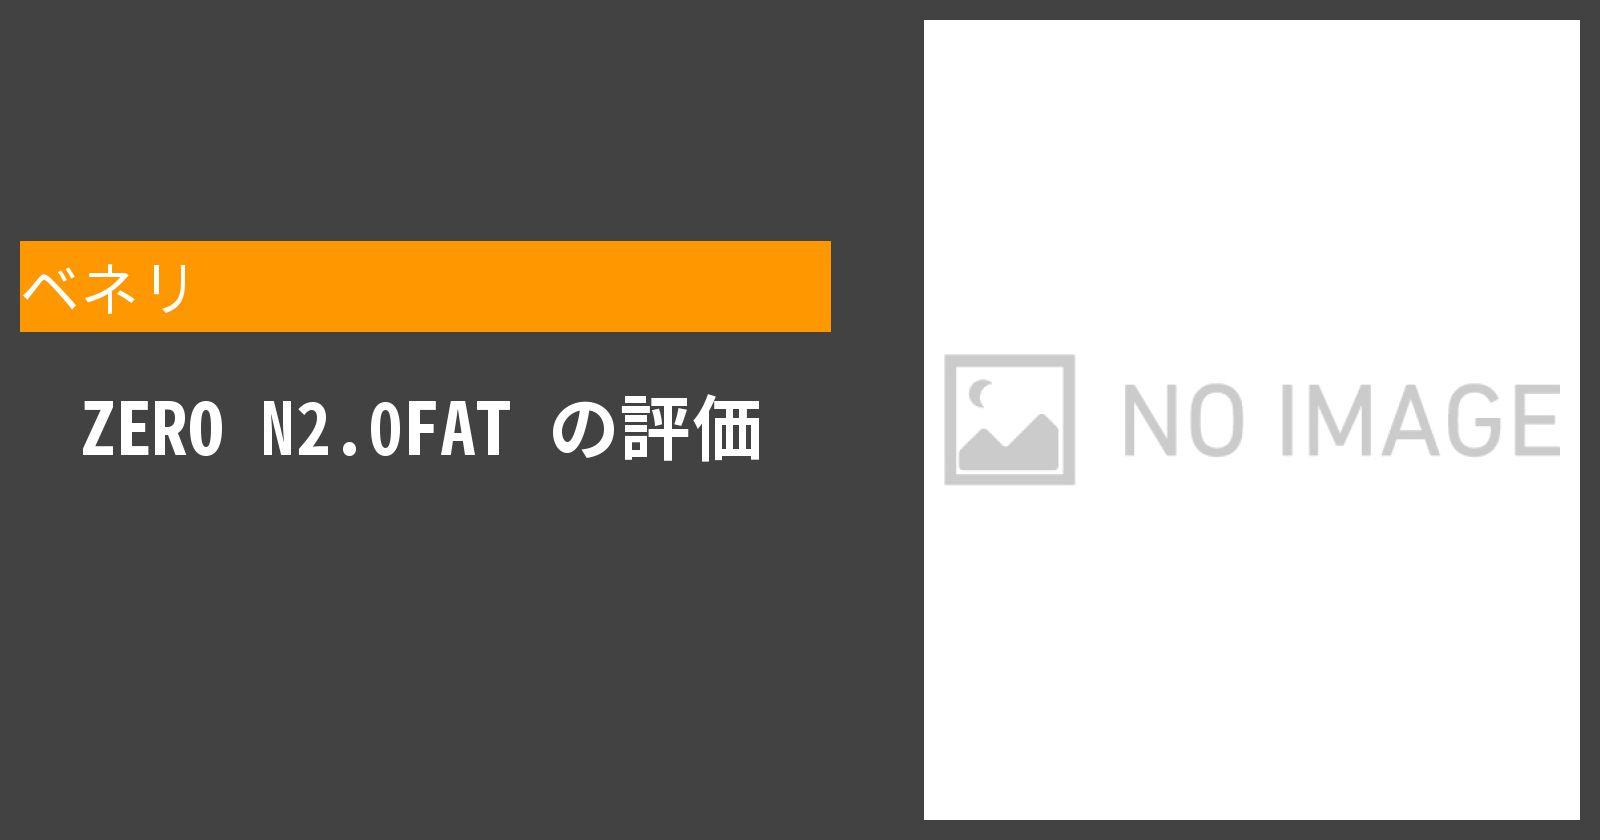 ZERO N2.0FATを徹底評価